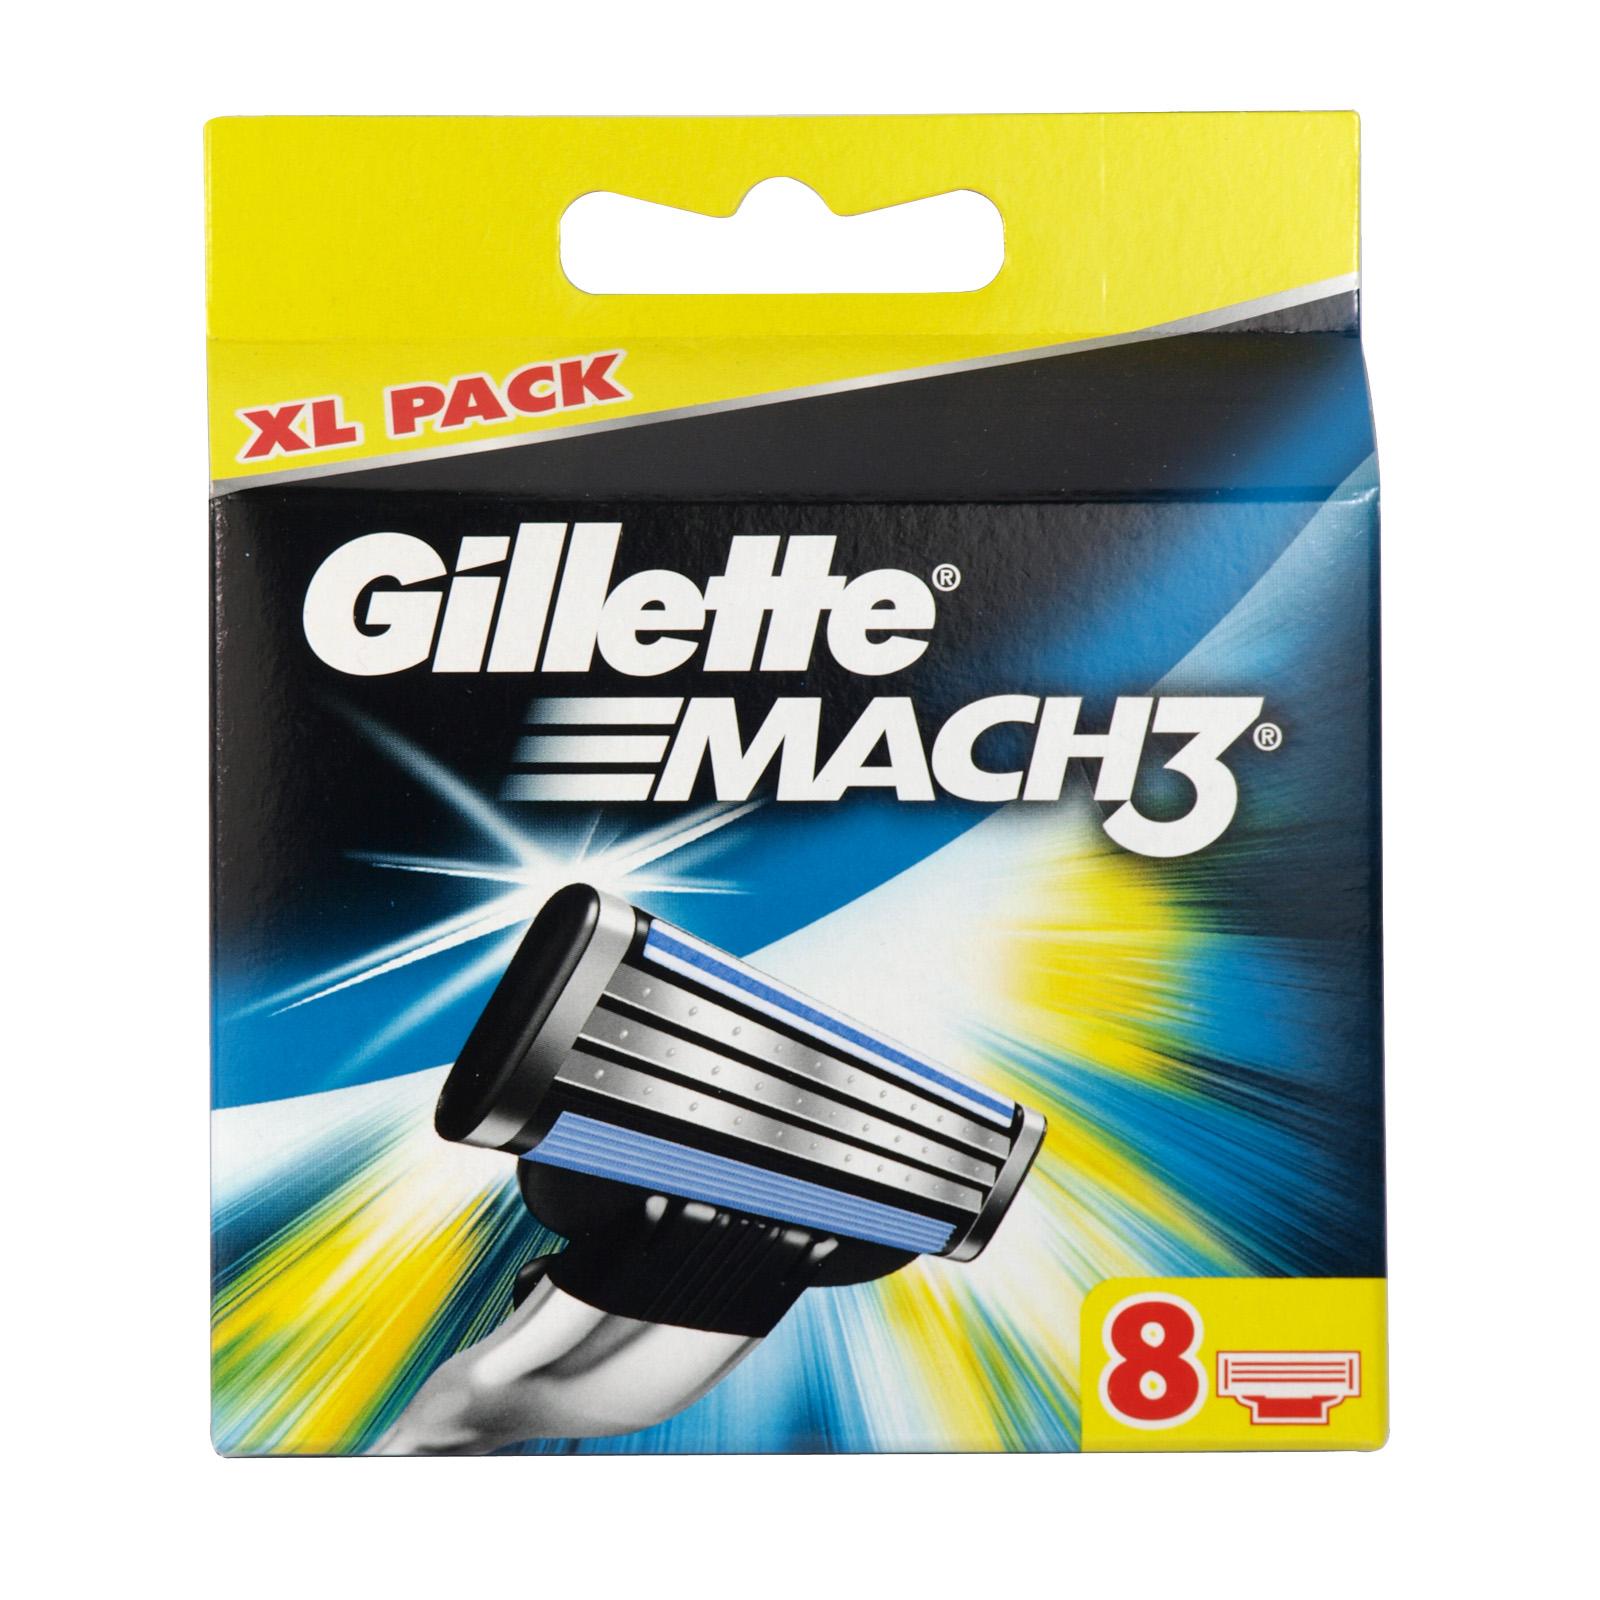 GILLETTE MACH 3 CART 8S